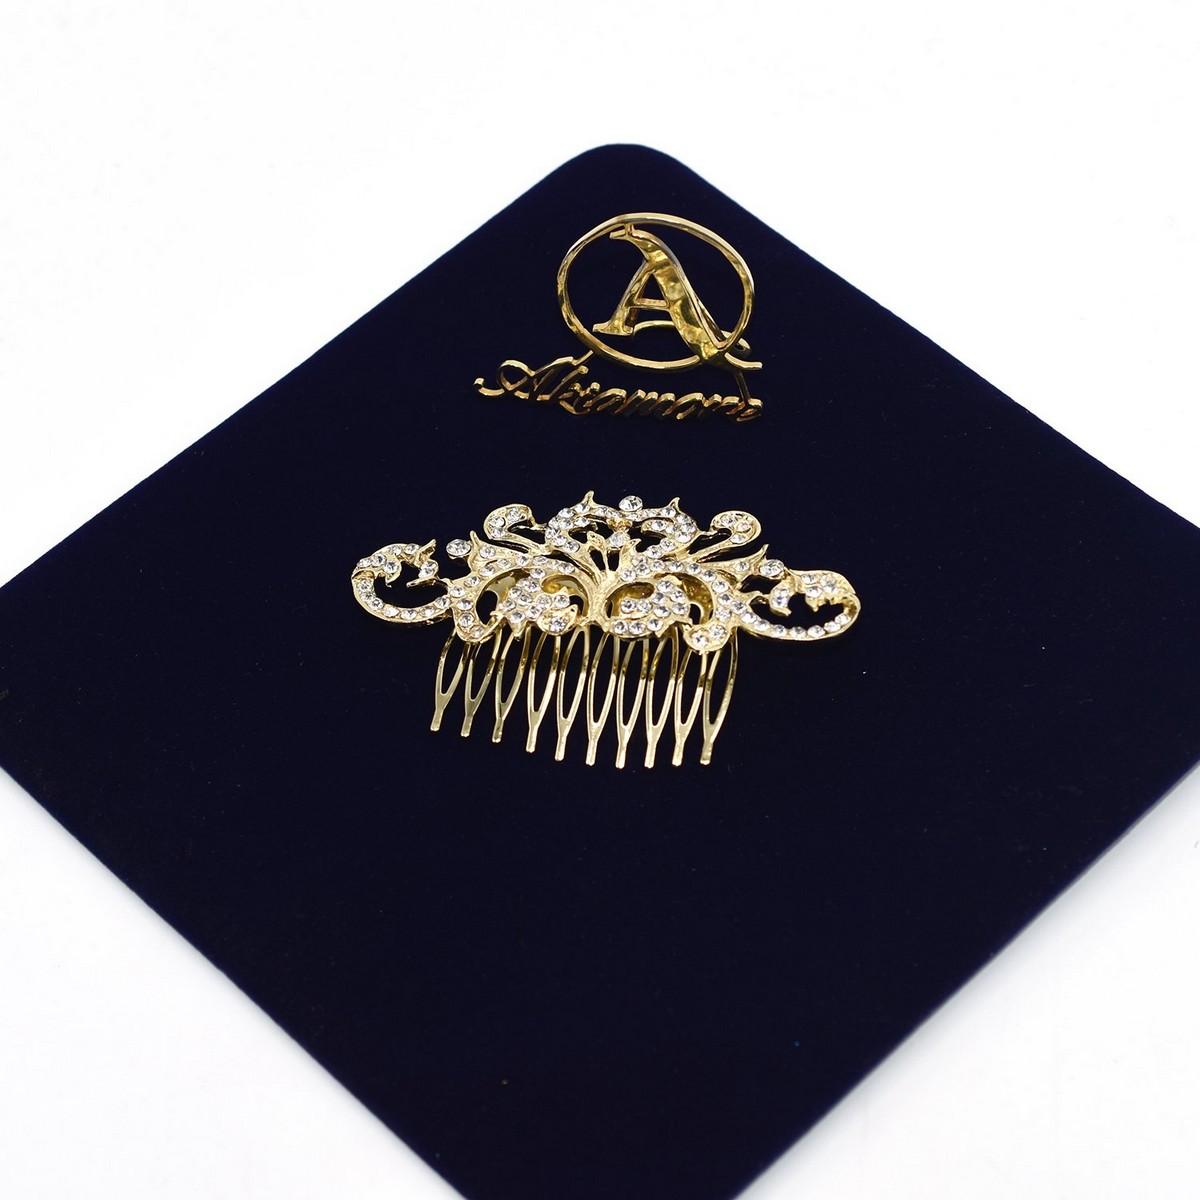 Crystal Bridal Hair Clip Vintage Handmade Hair Ornaments Europe and America Headpiece Wedding Hair Accessories